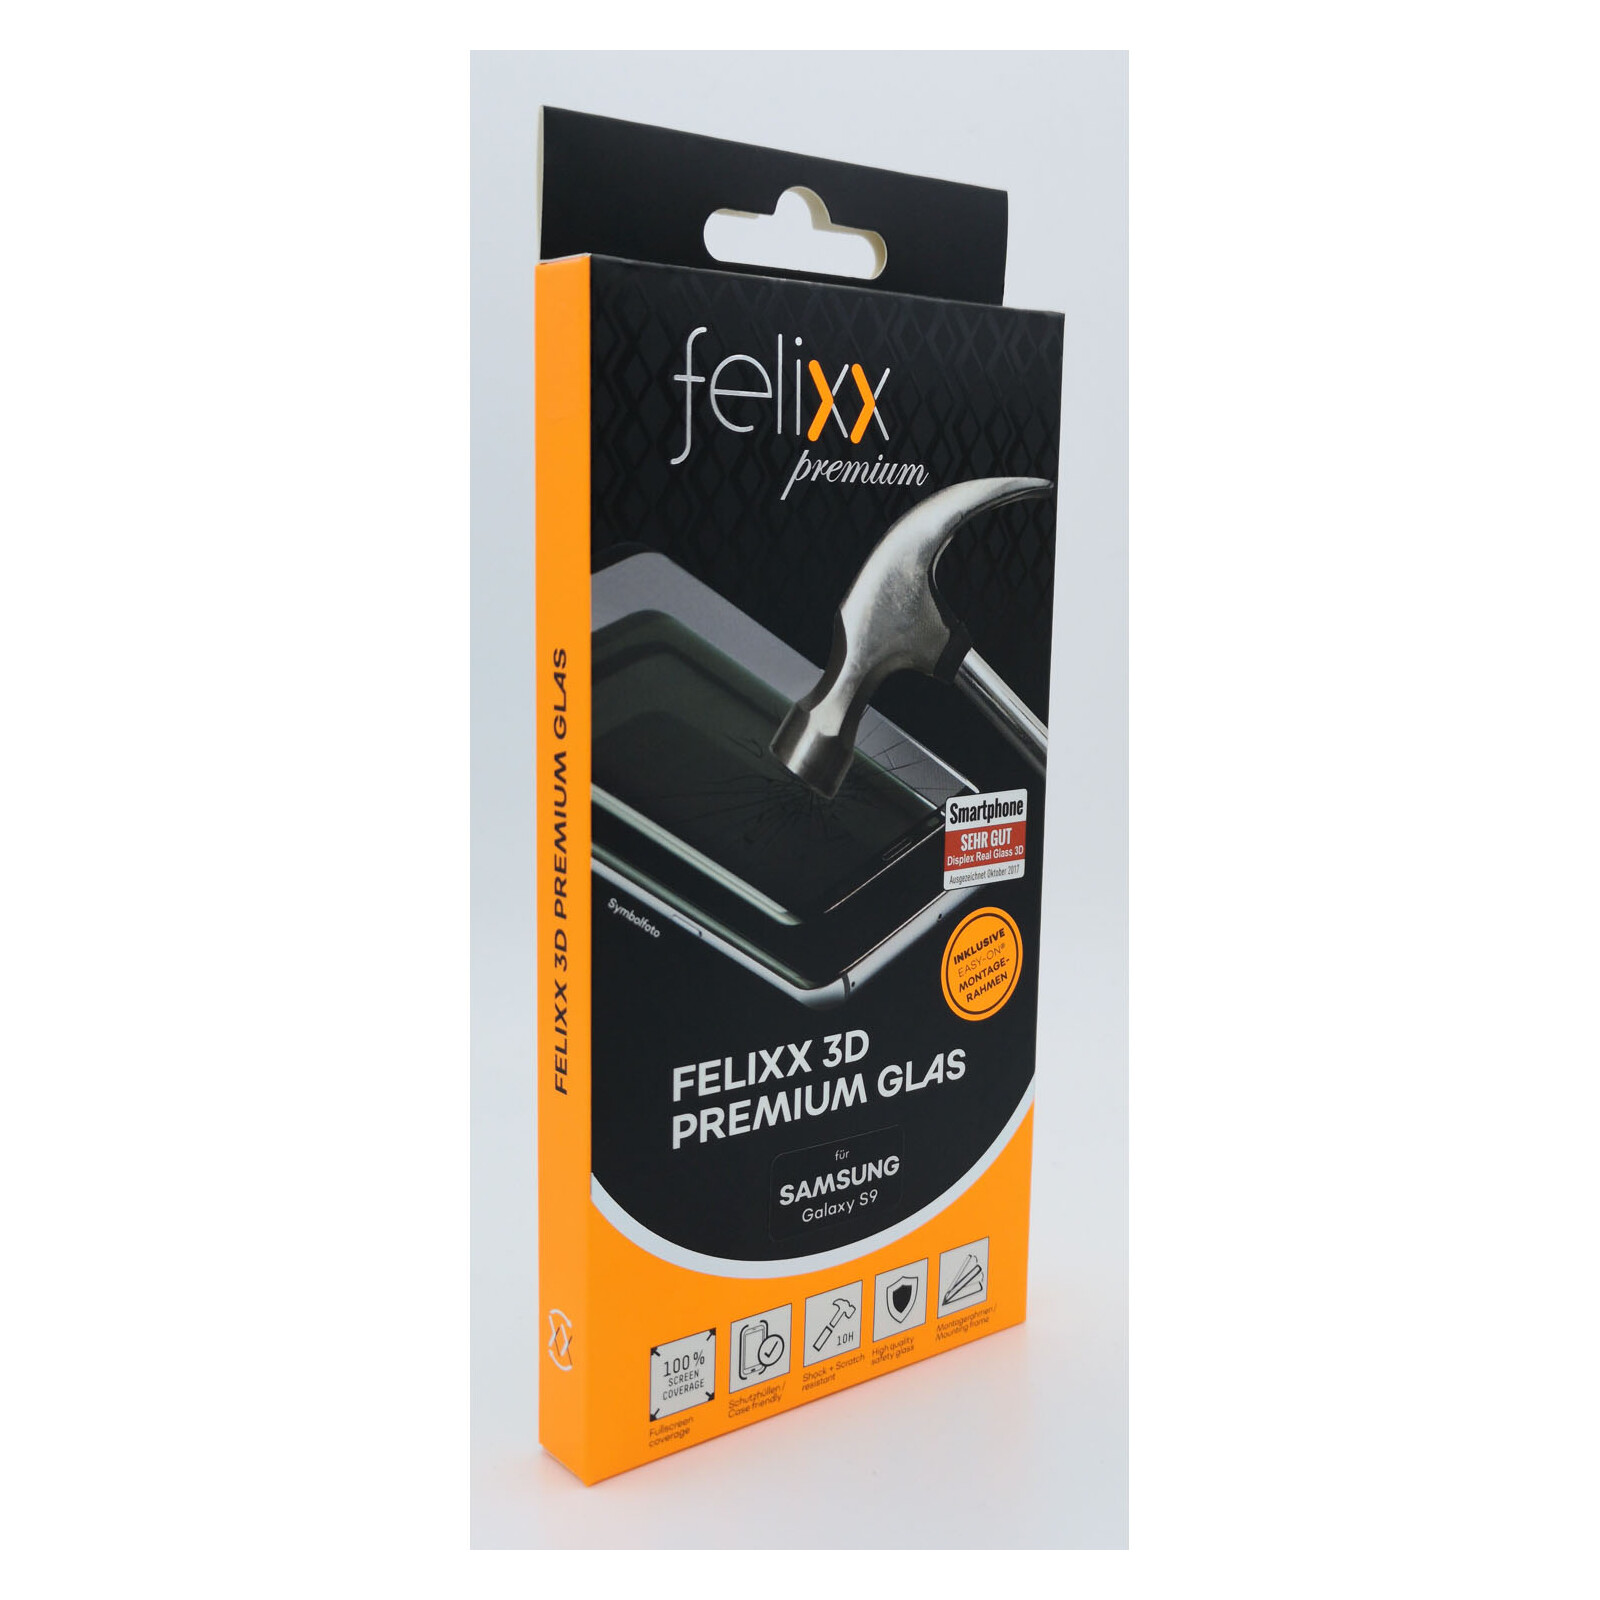 Felixx 3D Premium-Glas Full Samsung Galaxy S9